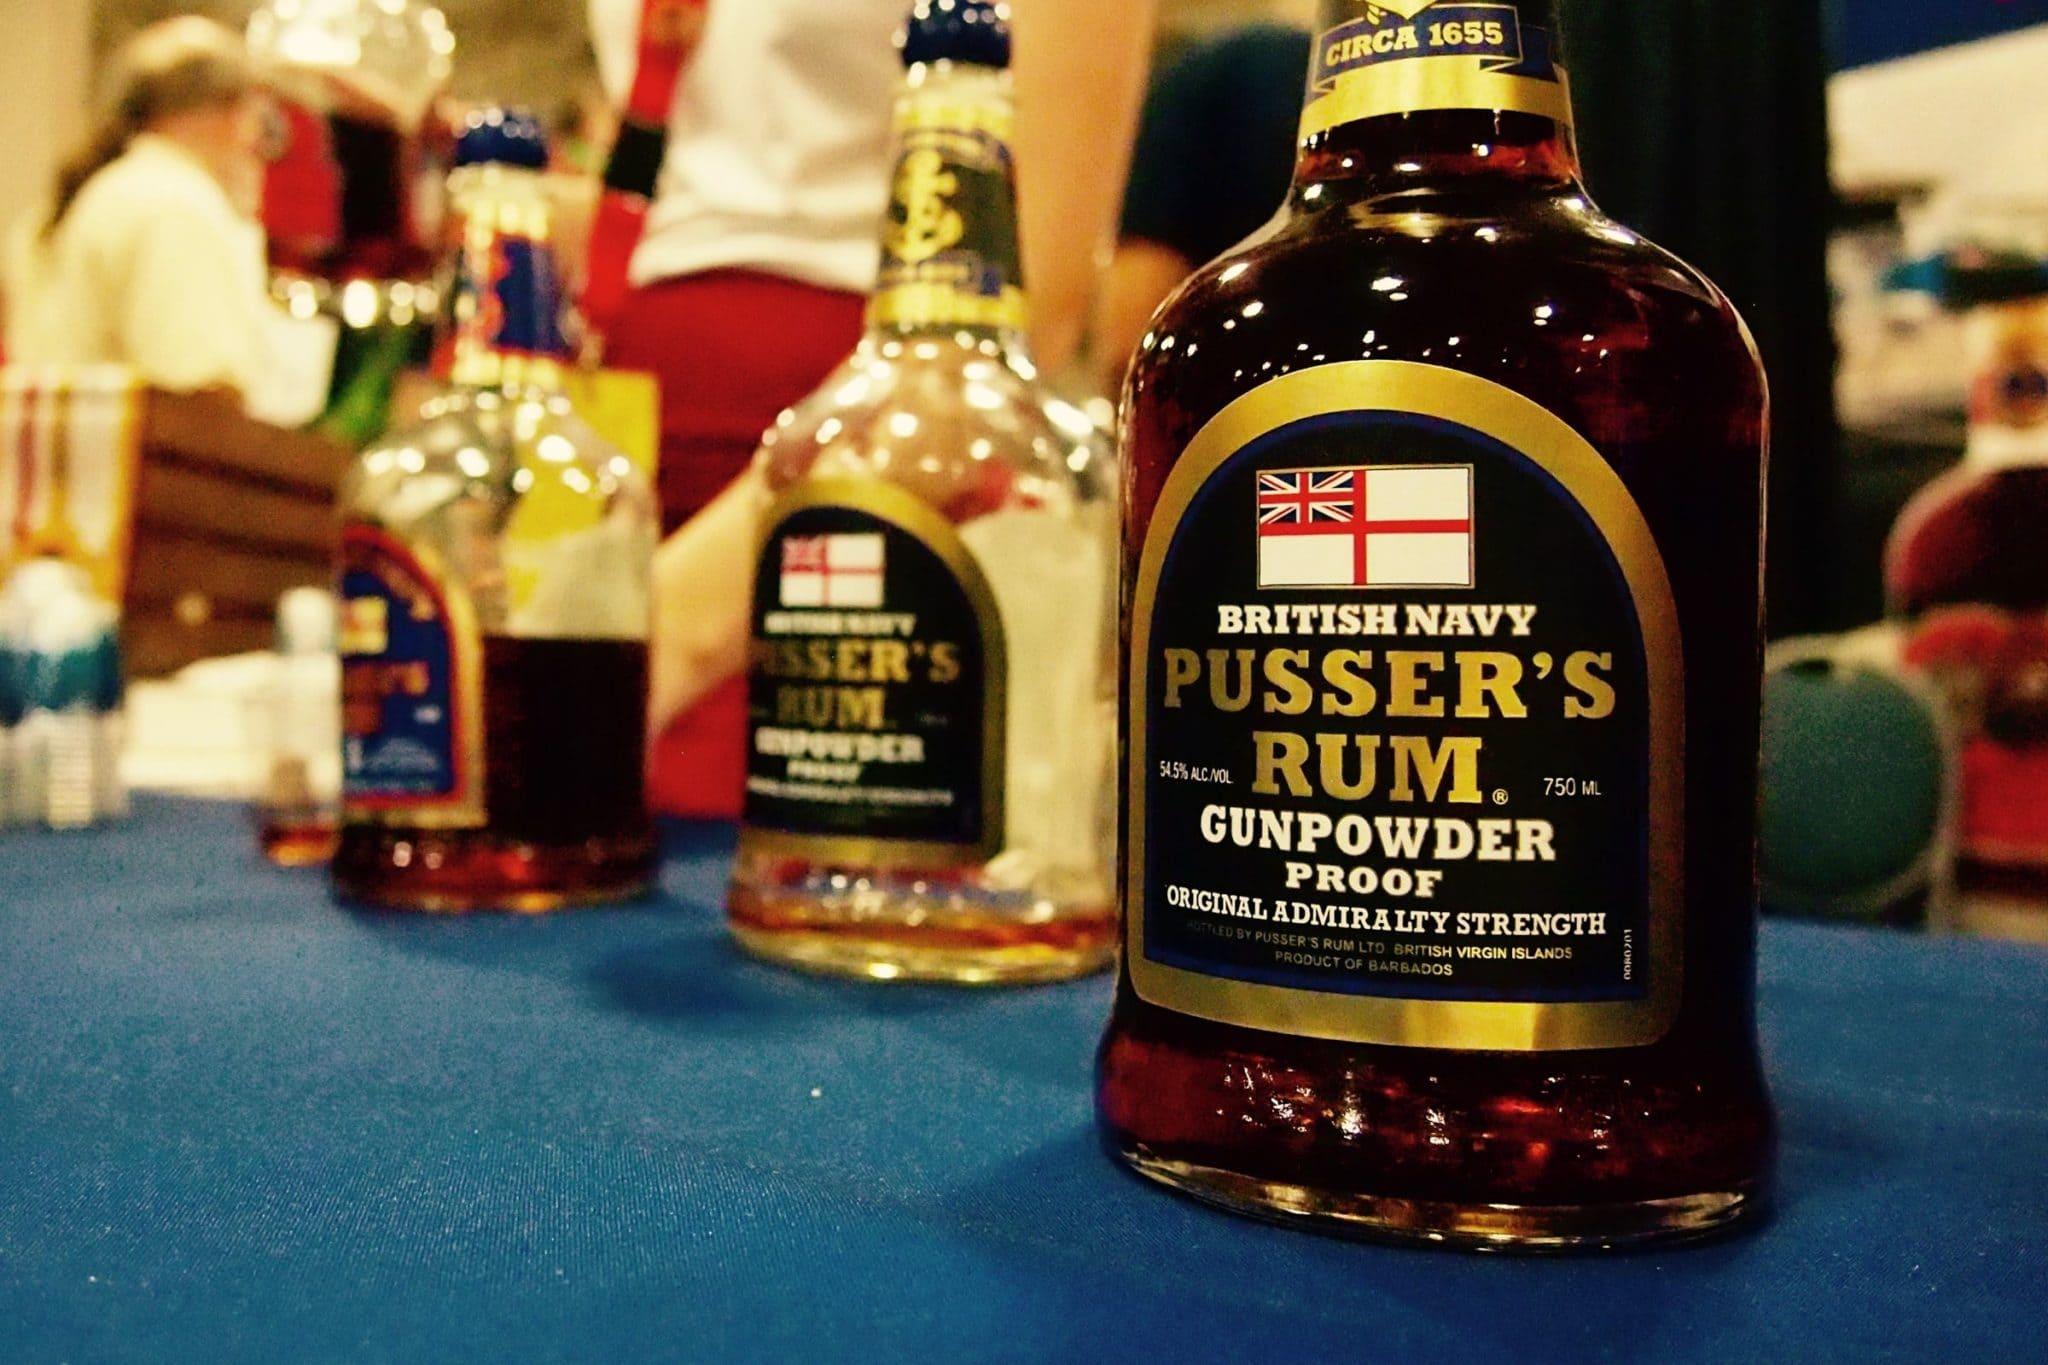 What's Old is Amazing in Pusser's Rum Gunpowder Proof